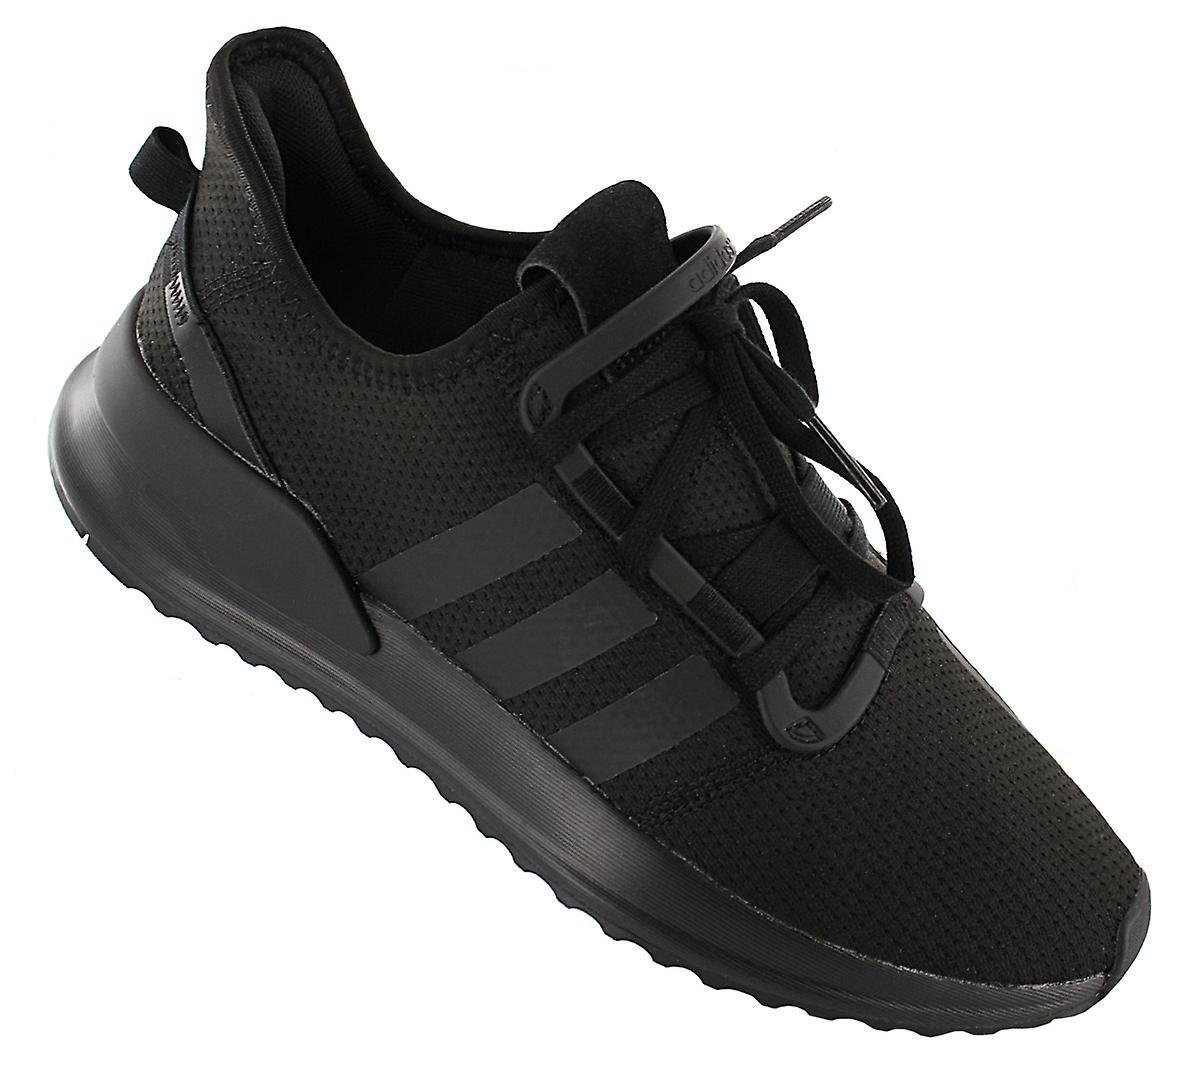 adidas U Path Run G27636 Herren Schuhe Schwarz Sneakers Sportschuhe muNNVg